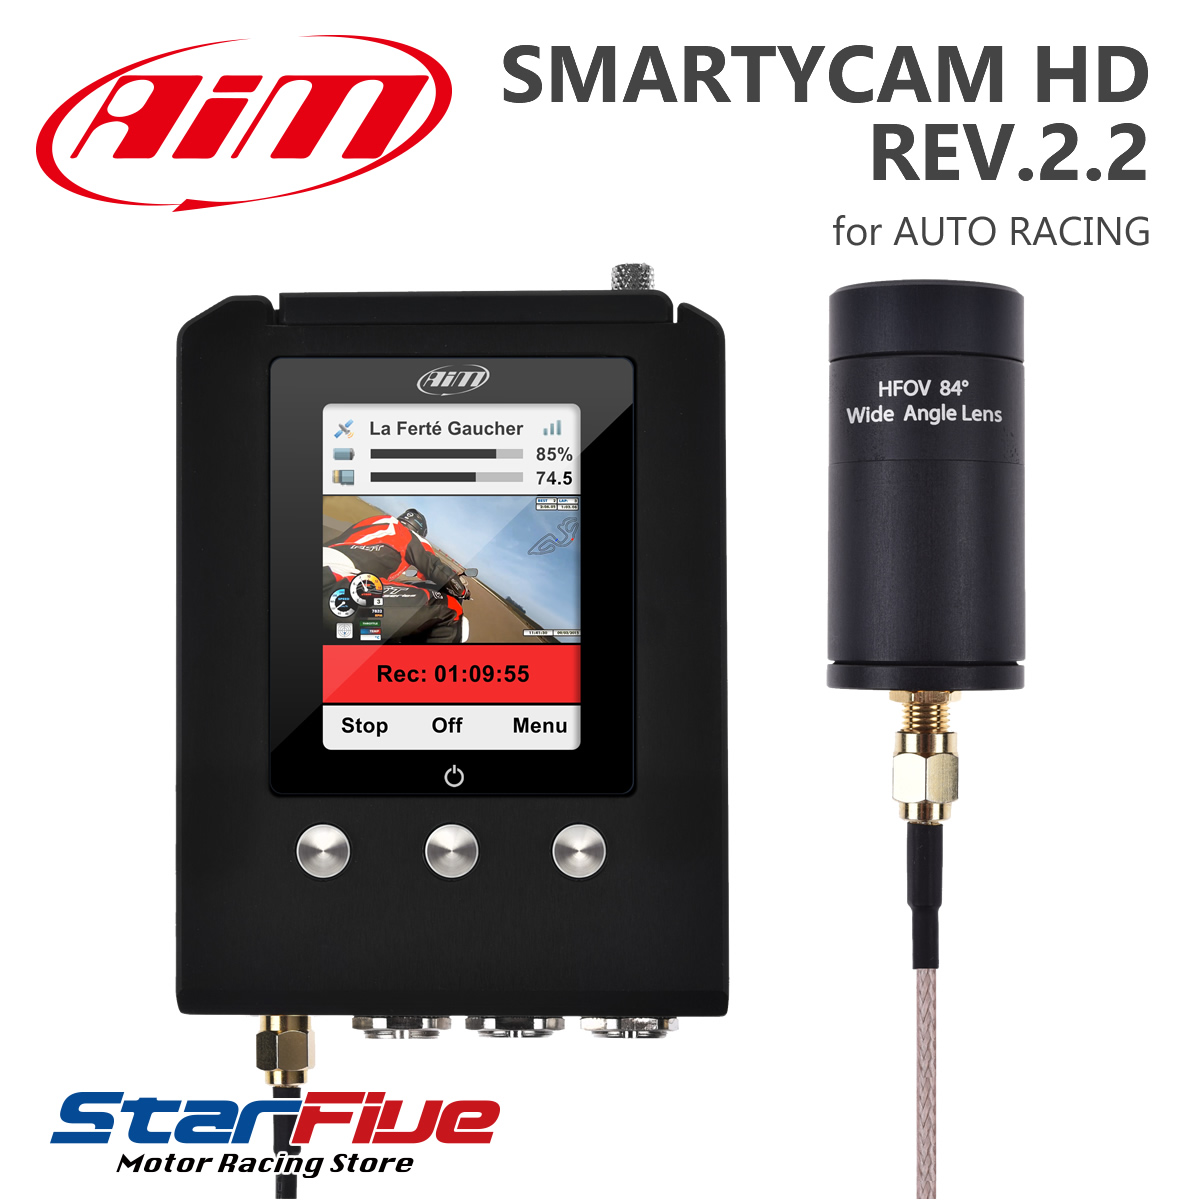 Aim SMARTYCAM GP HD REV.2.2 デジタルビデオカメラ 車載オンボード(エーアイエム)